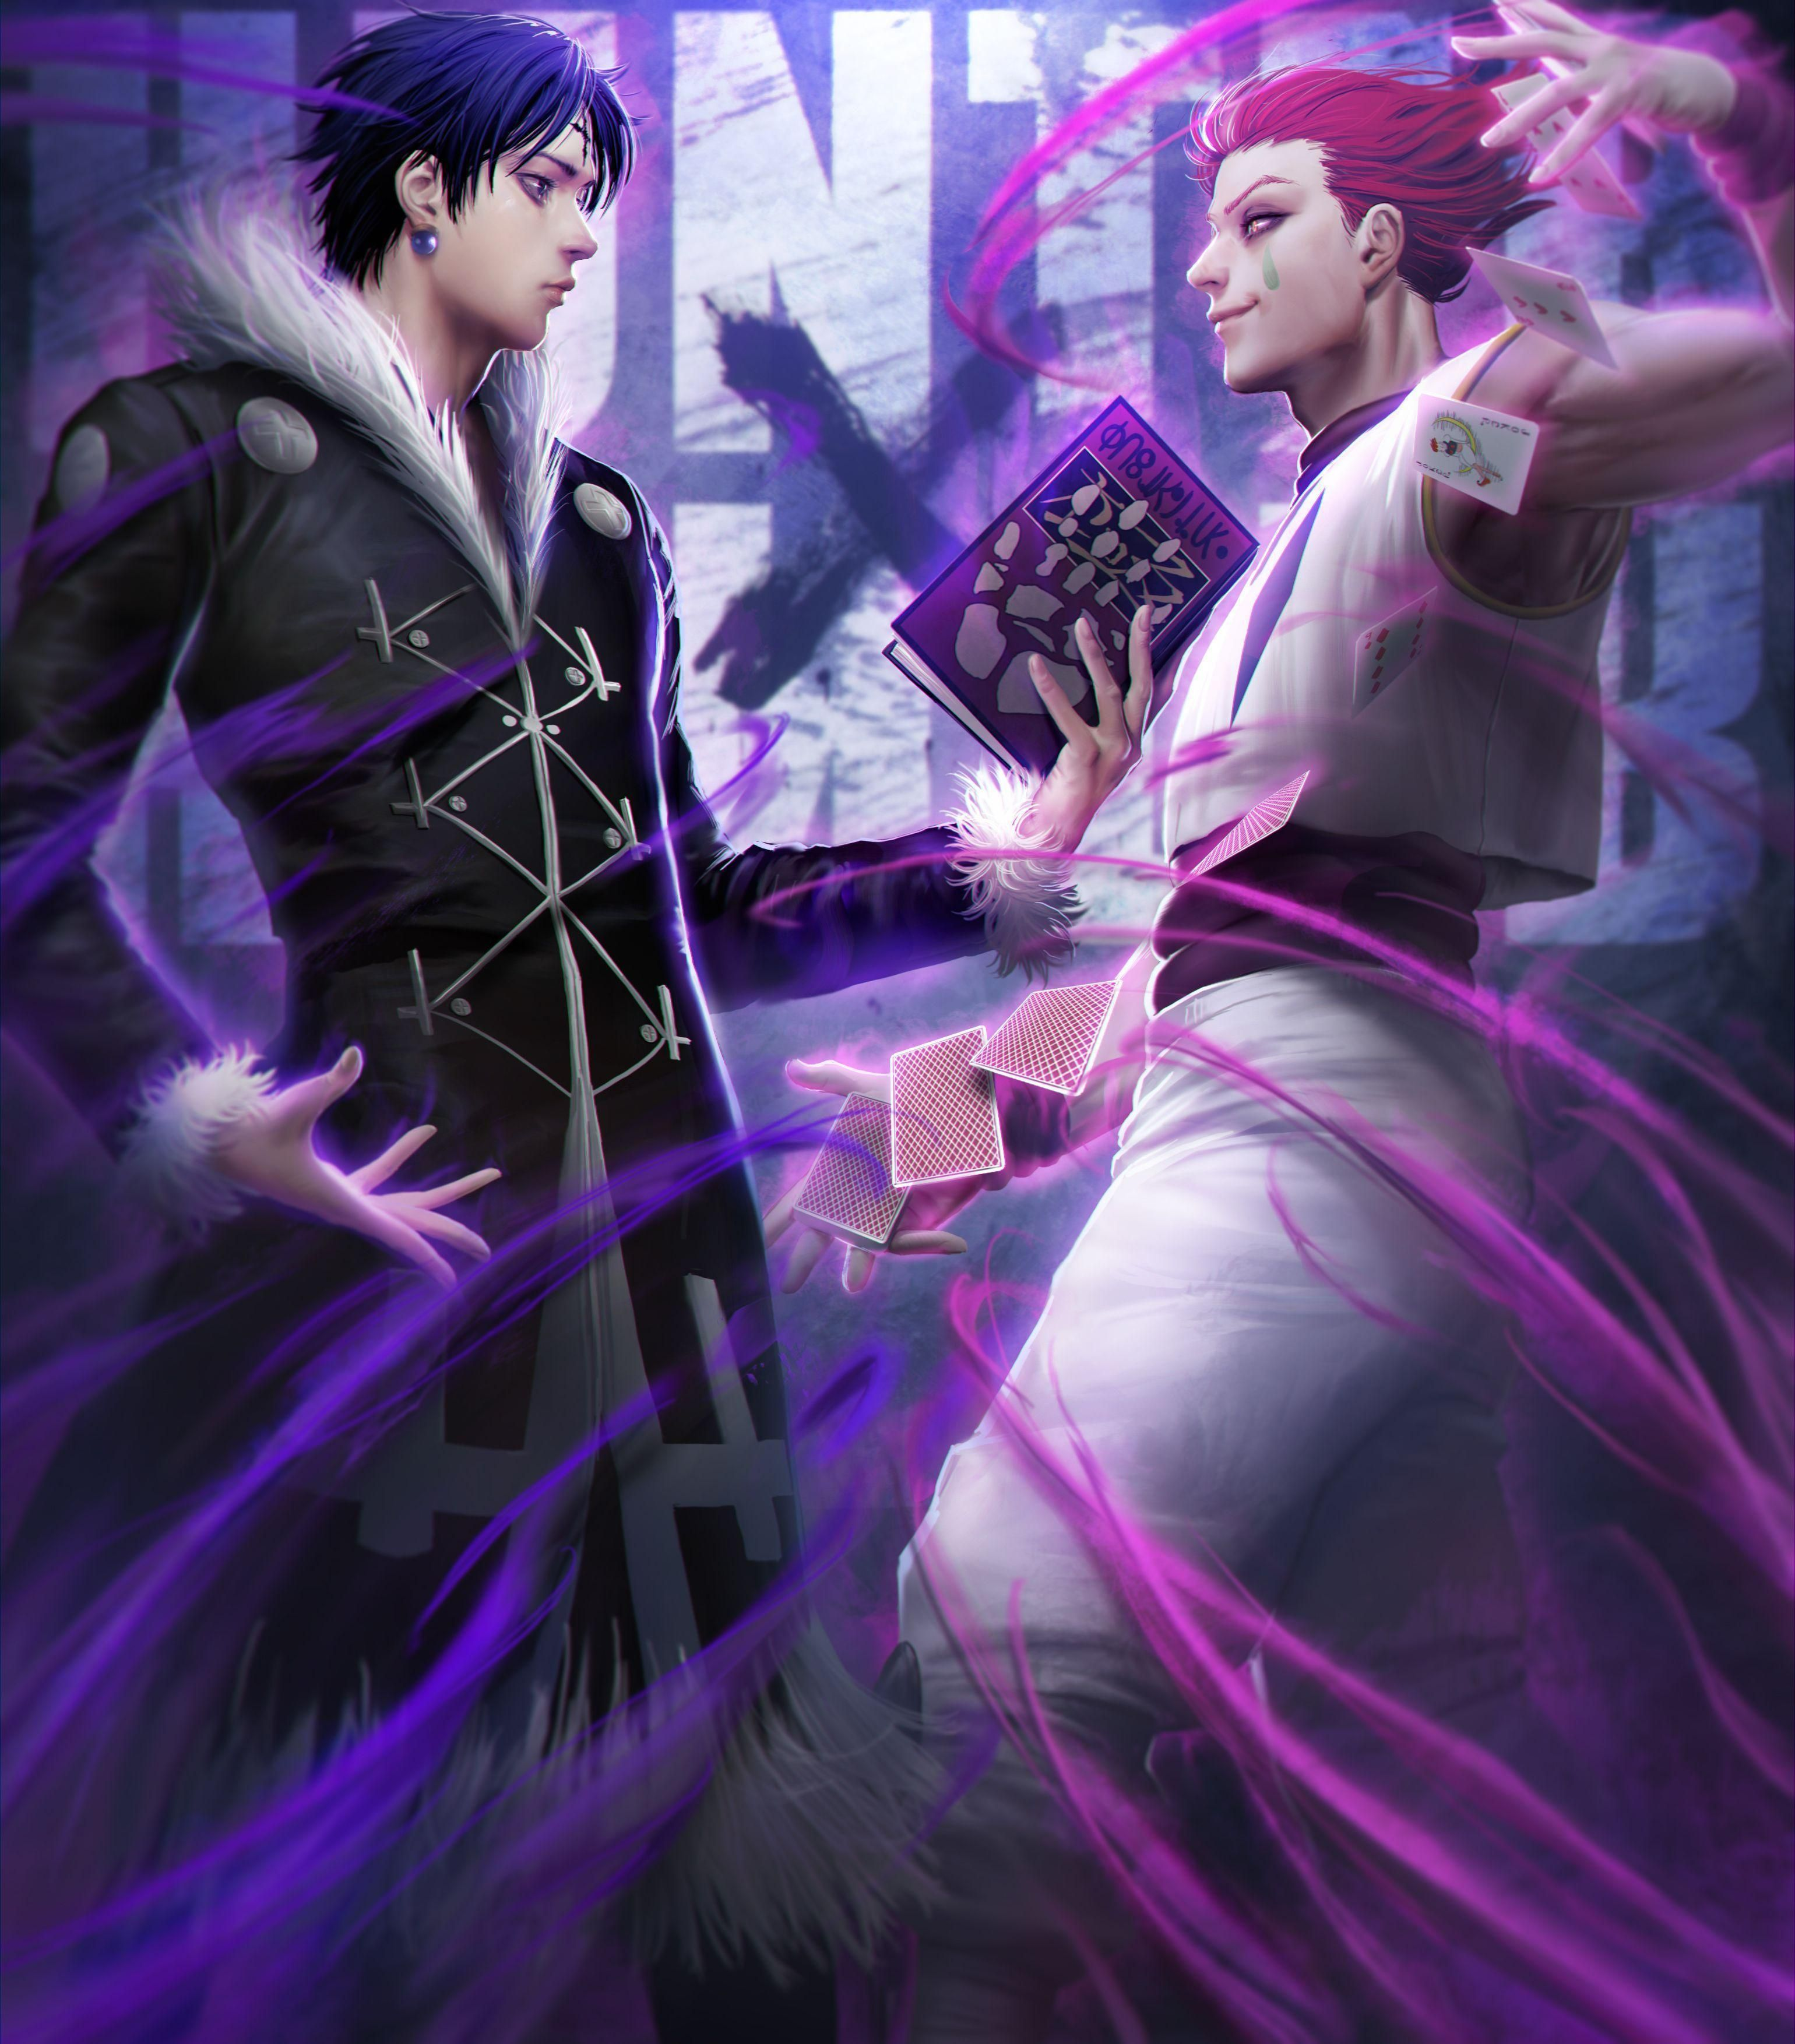 17895 Hisoka Wallpaper Hunter X Hunter Hisoka Anime